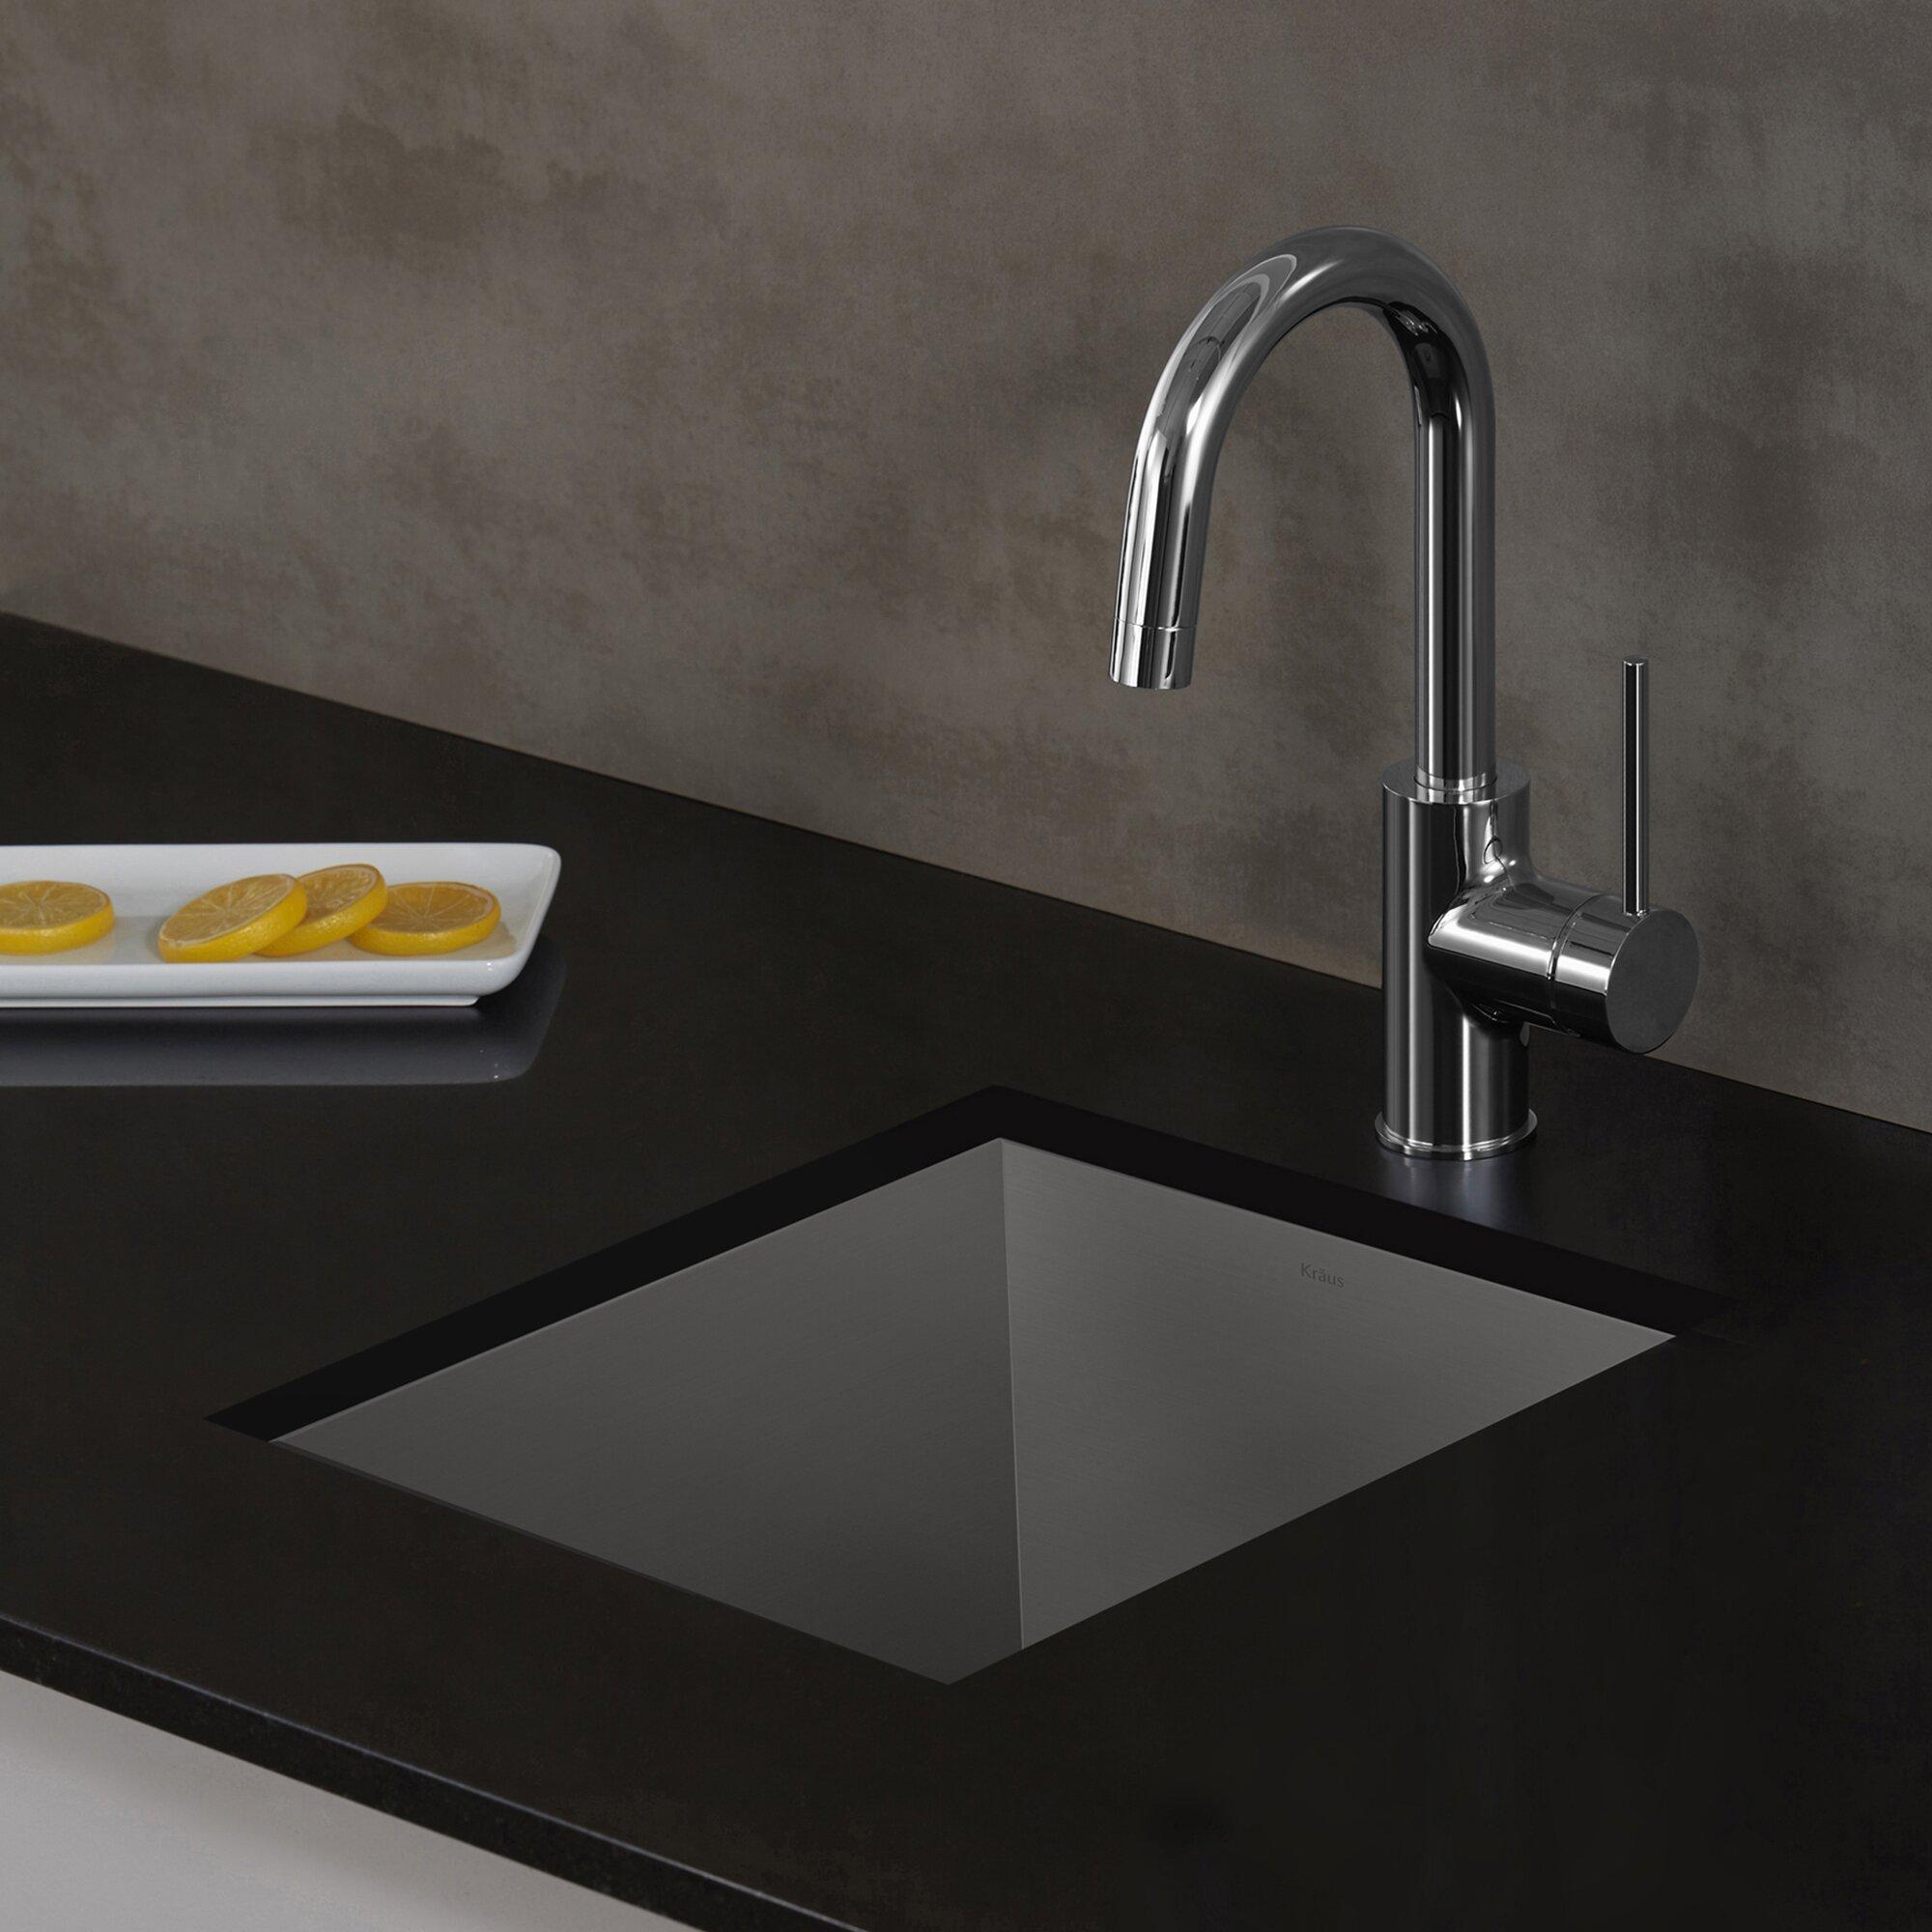 Kraus Oletto Single Lever Kitchen Bar Faucet Reviews Wayfair